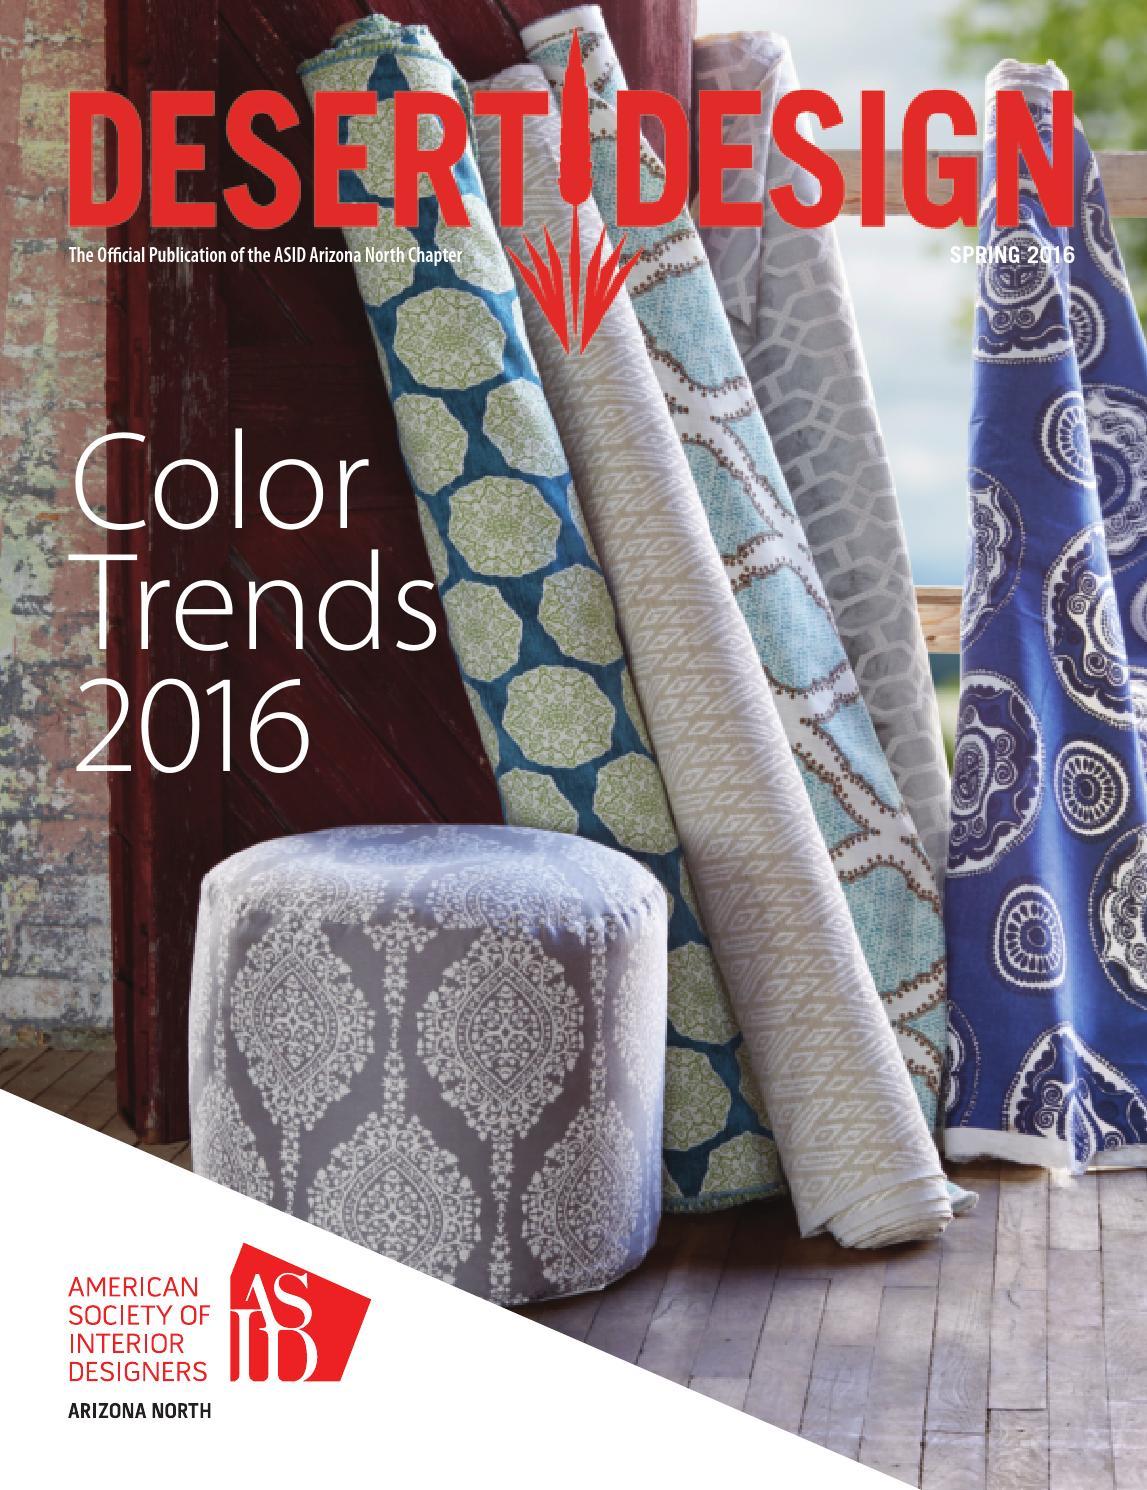 Desert Design Magazine Spring 2016 By Arizona North Chapter Of ASID